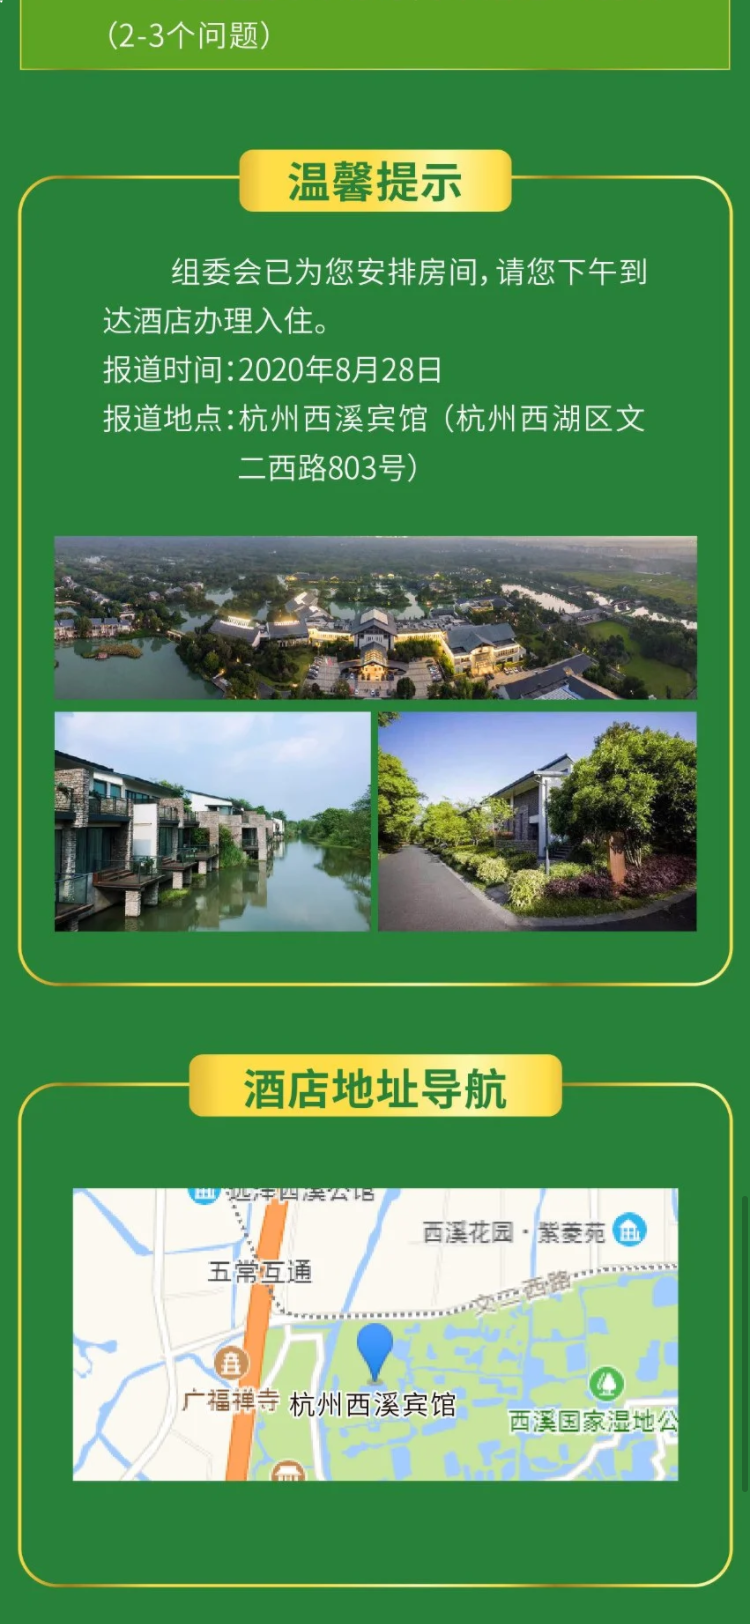 WeChat Image_20200819162537.png